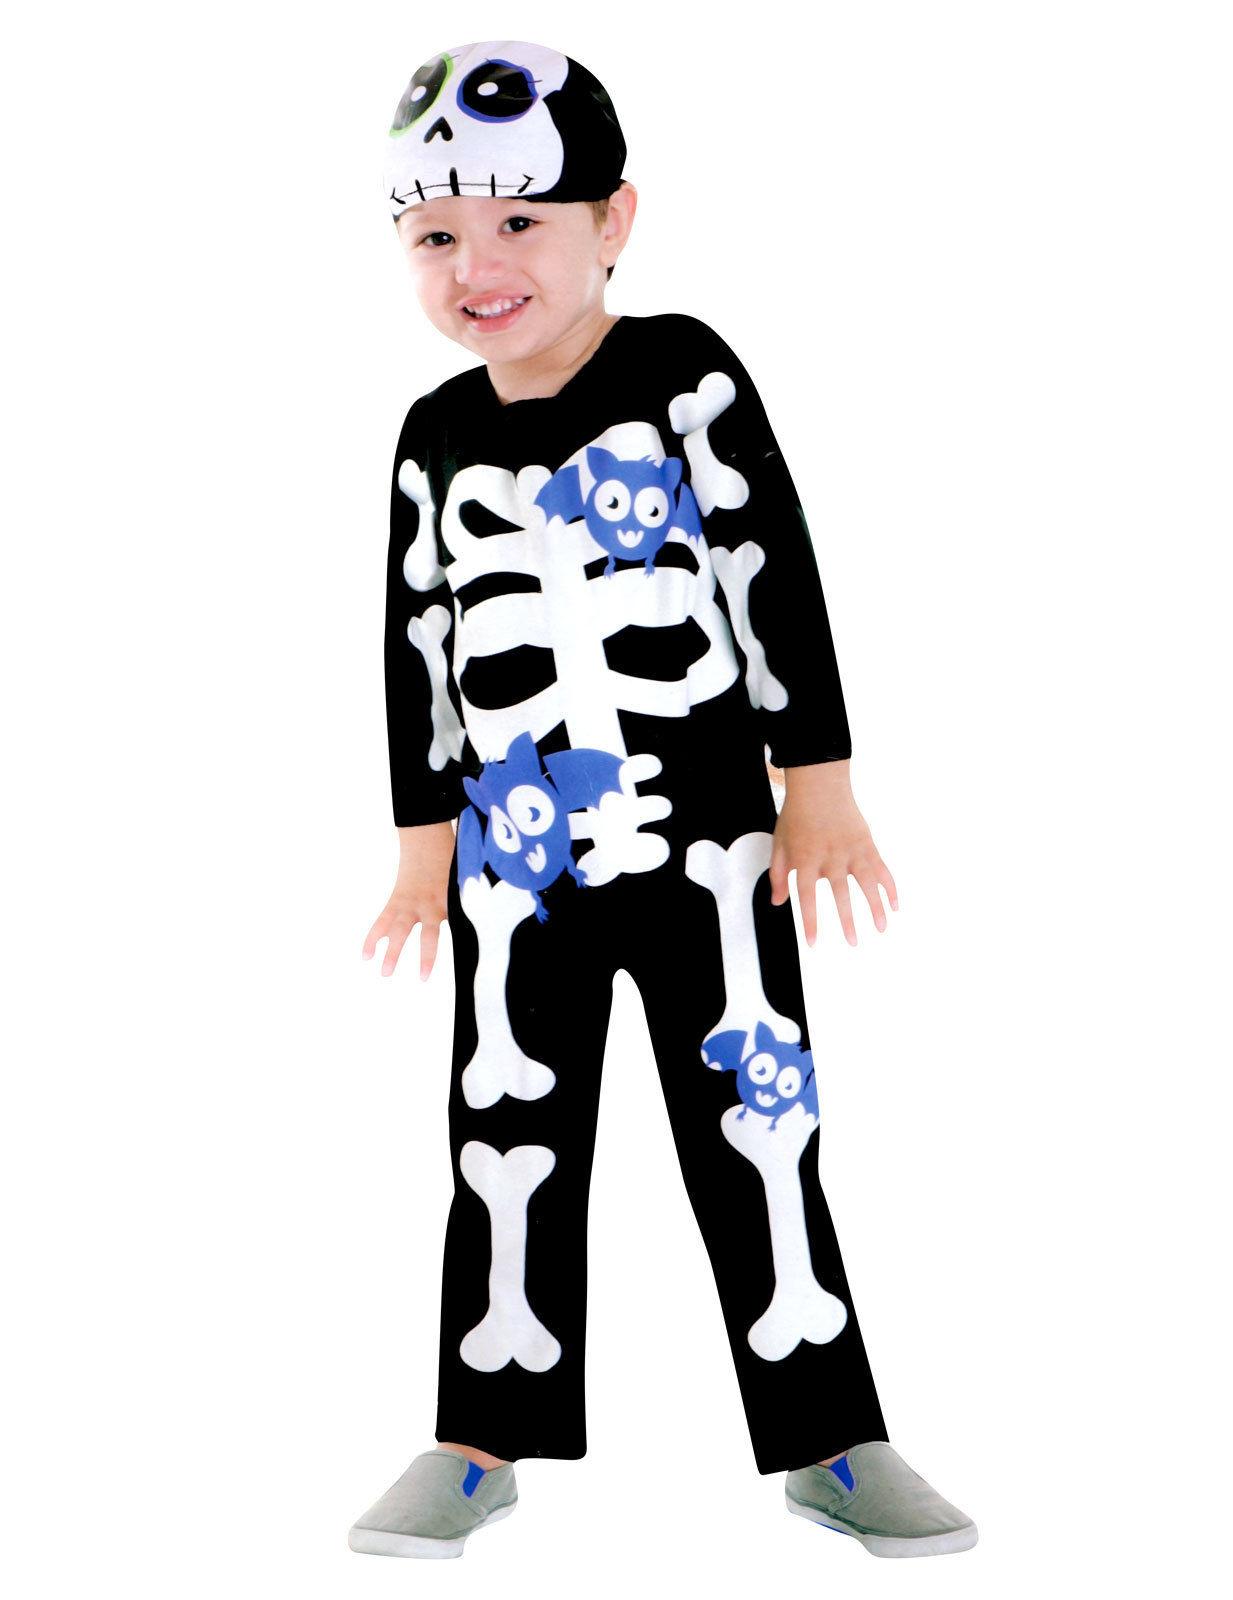 kost m als skelett mit lila flederm usen f r kinder zu halloween kost me f r kinder und. Black Bedroom Furniture Sets. Home Design Ideas